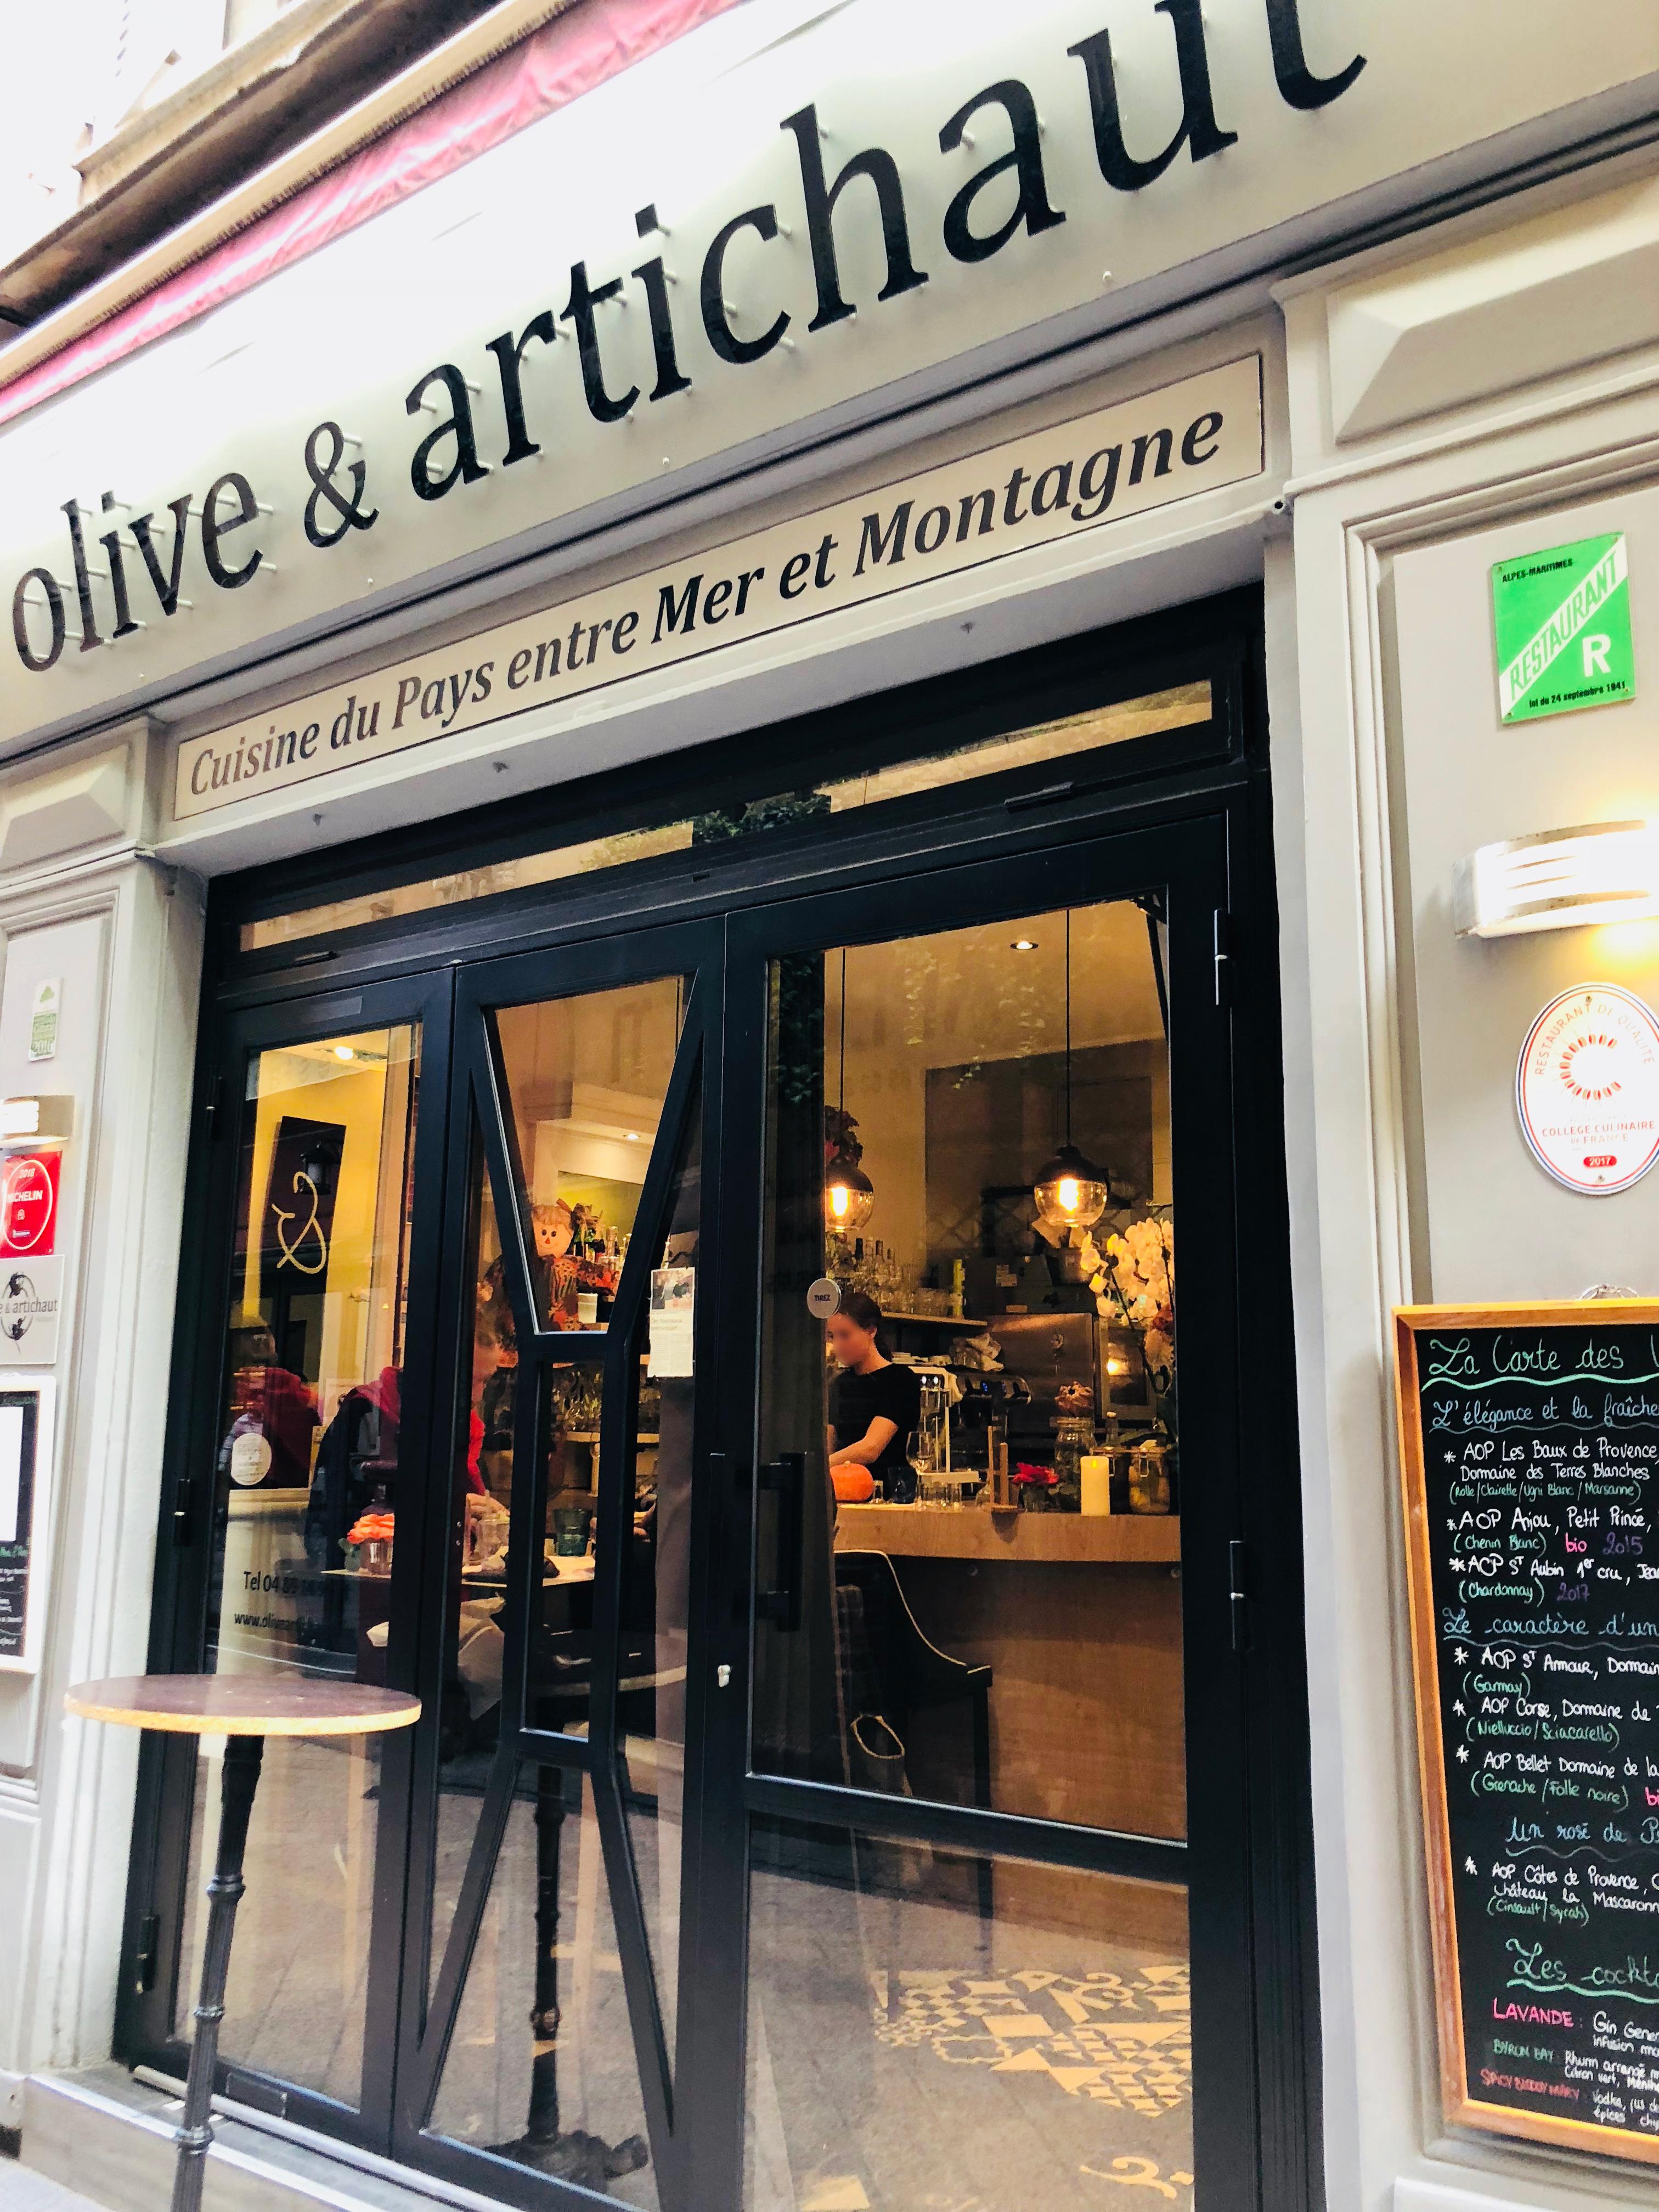 Restaurant Nice Olive et Artichaut